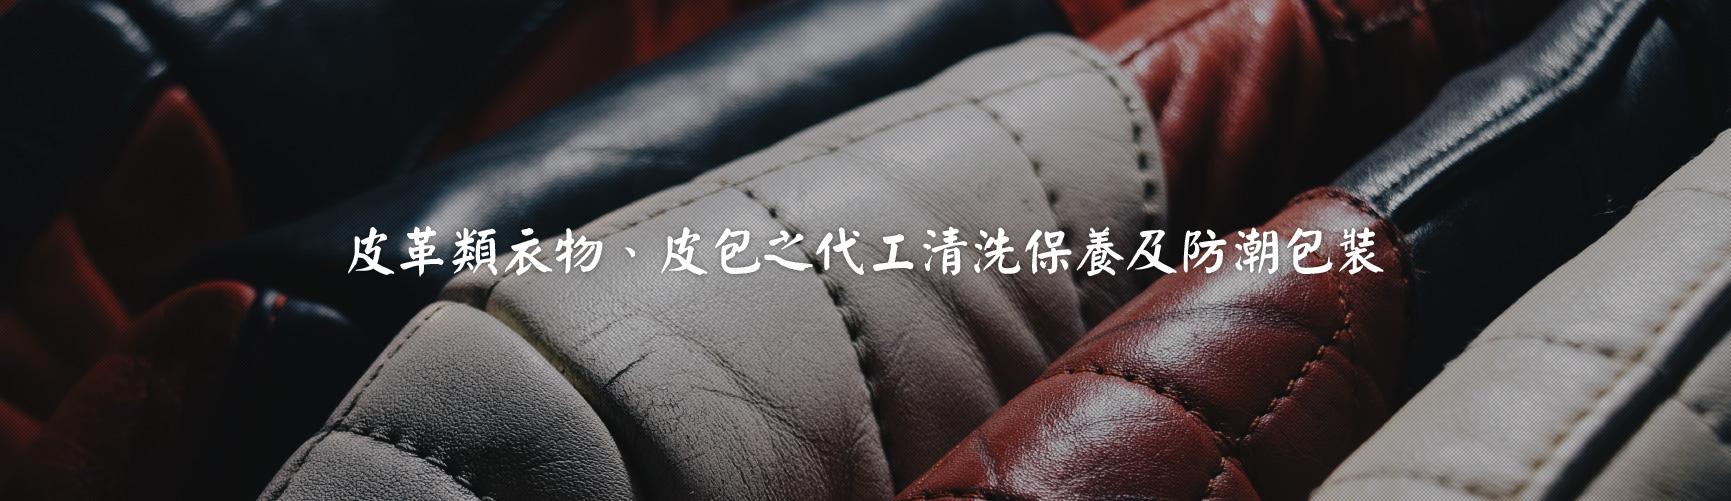 20170711162515171-original-楓禾極速架站-13.jpg